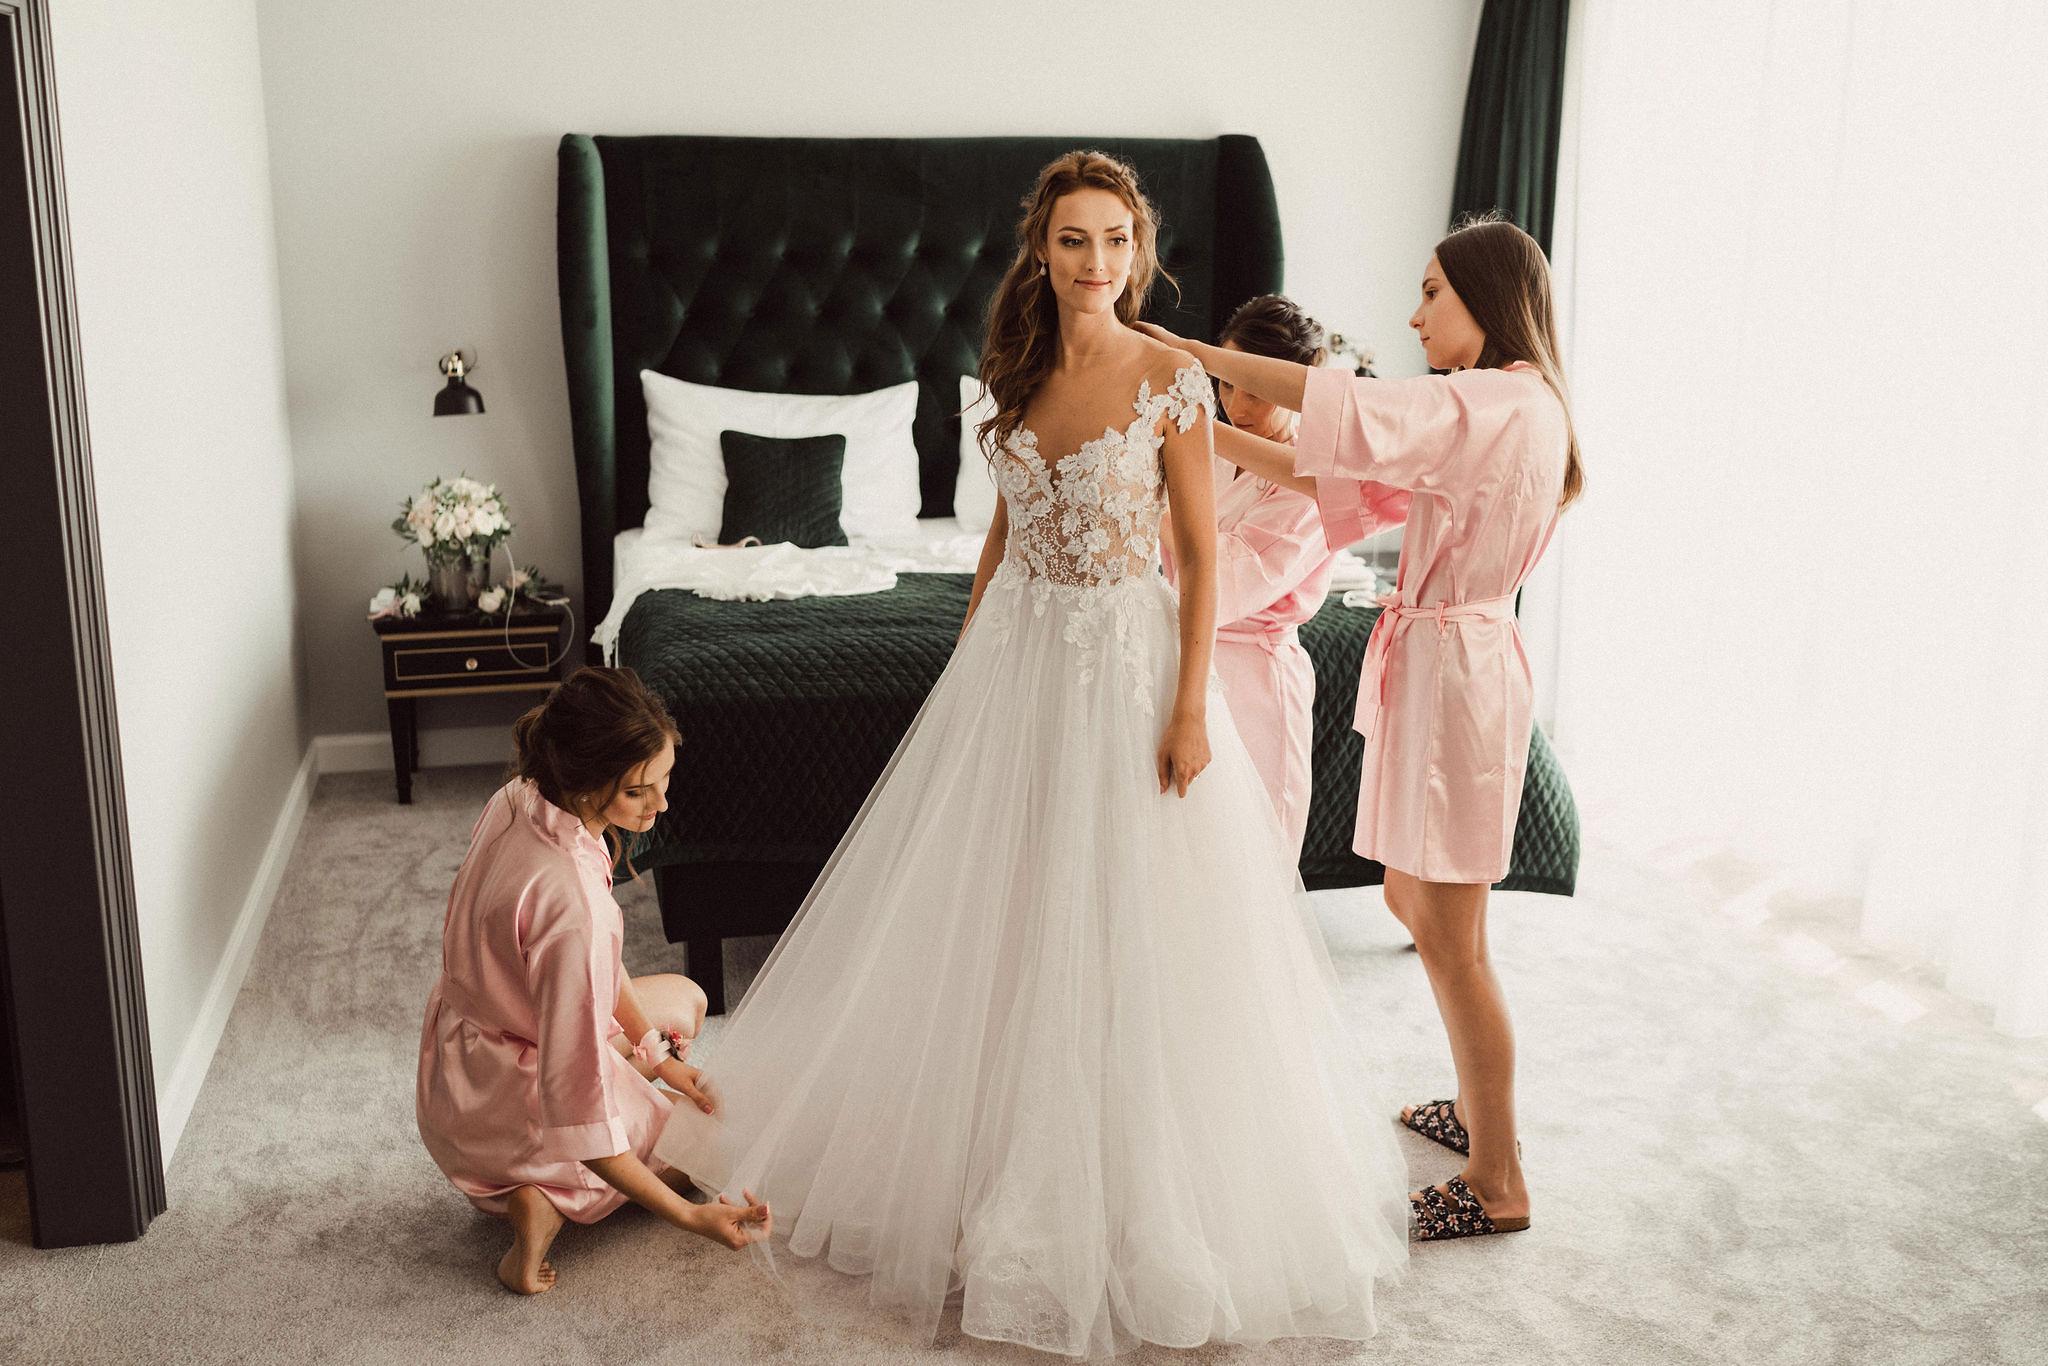 wedding-avenuejpg